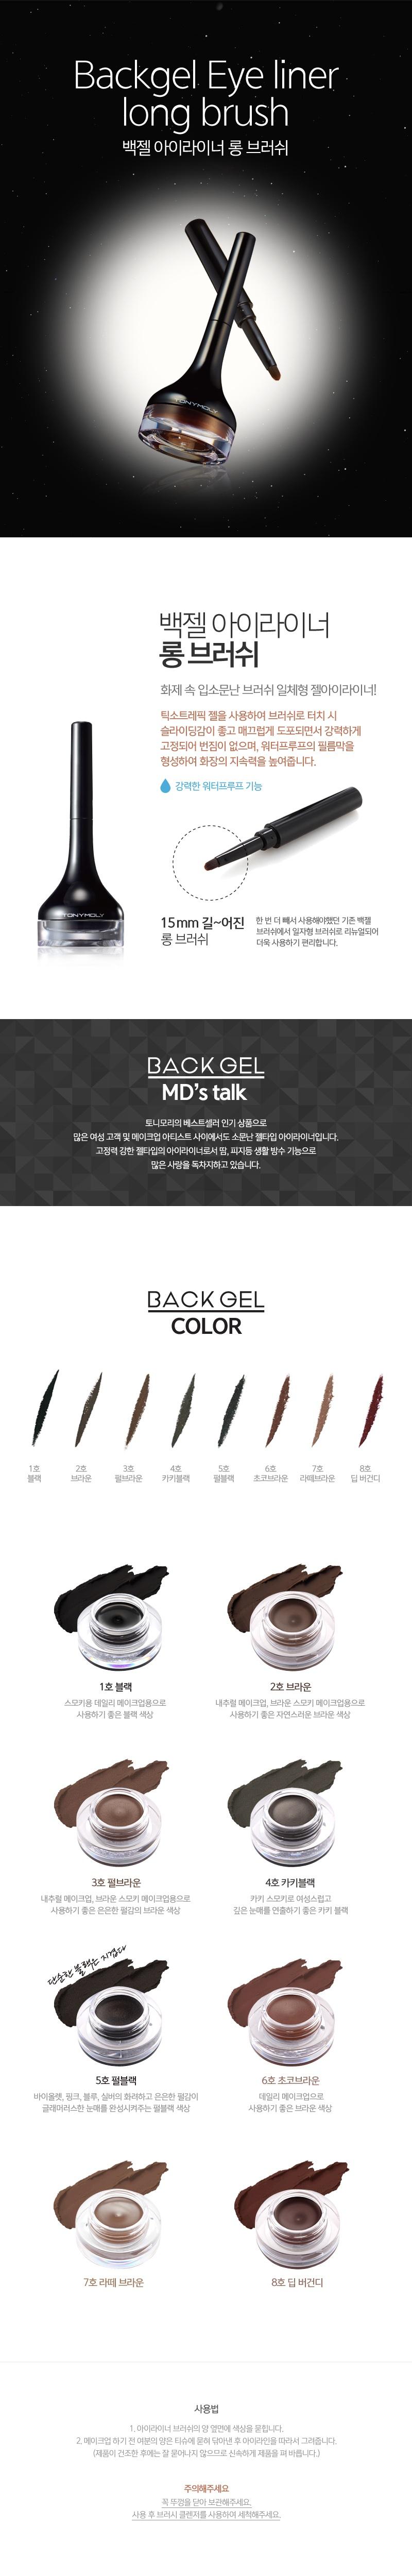 Tony Moly Back Gel Eye Liner Long Brush korean cosmetic makeup product online shop malaysia spain portugal1